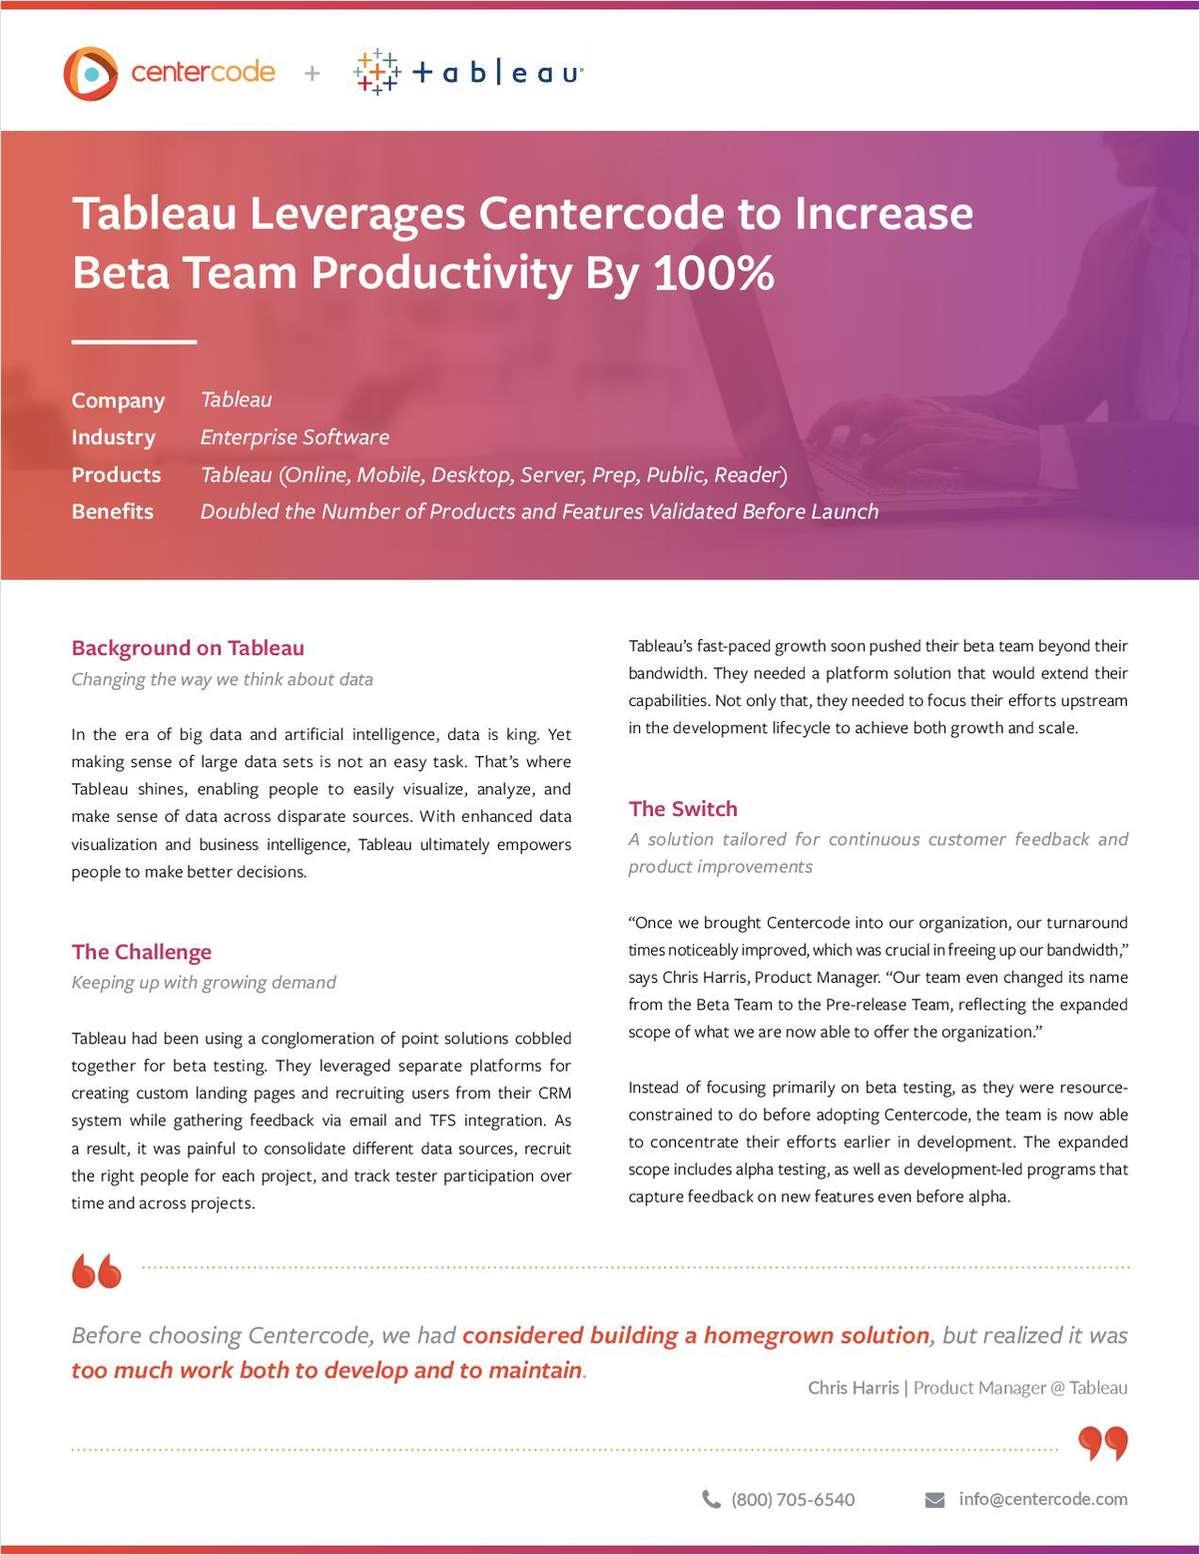 Centercode + Tableau Case Study